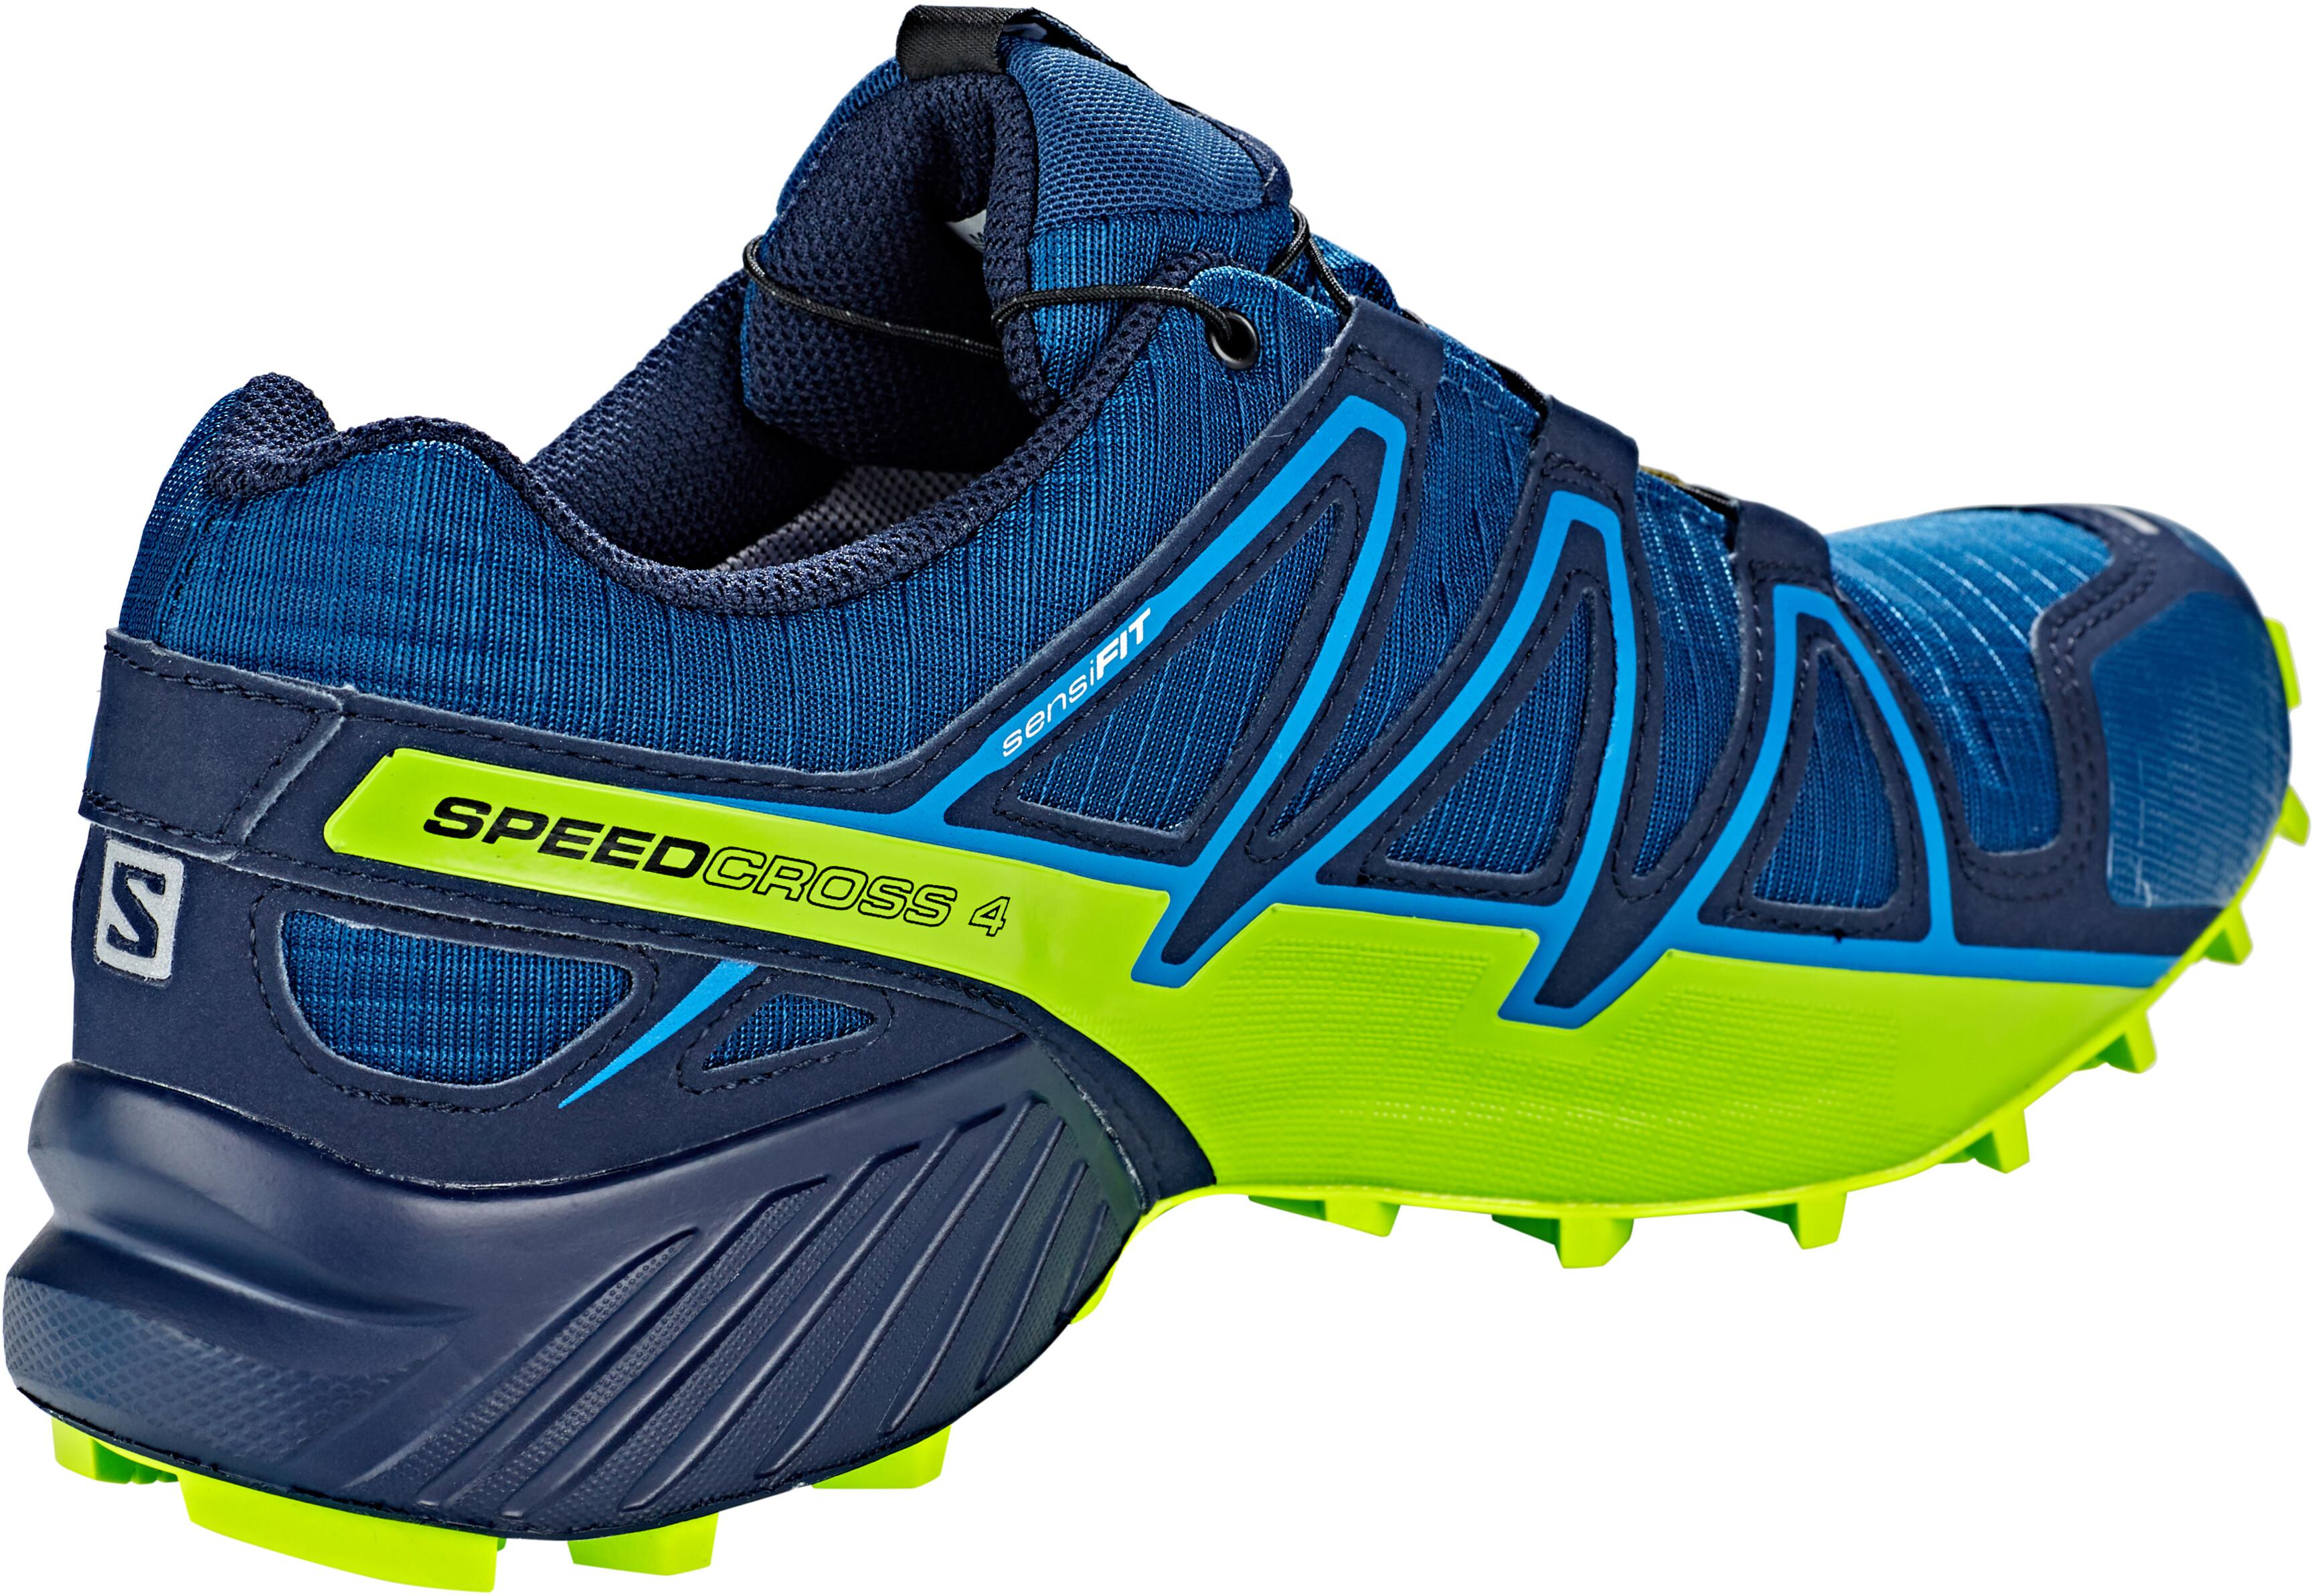 f6f8a0d5 Salomon Speedcross 4 GTX Shoes Men poseidon/navy blazer/lime green ...